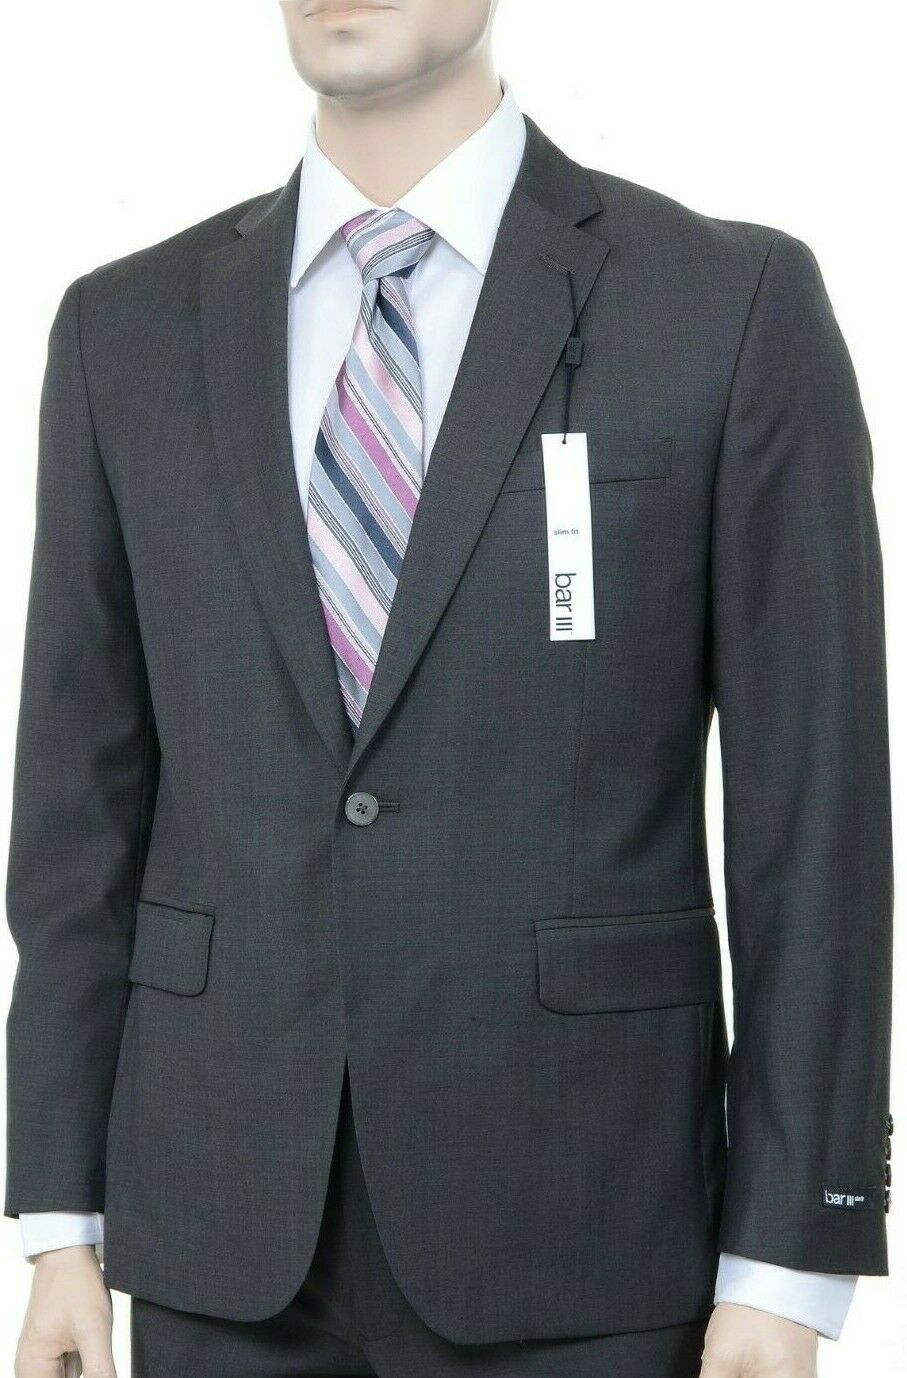 Bar III Slim Fit Solid Brown Two Button 100% Wool Blazer Sportcoat 44L